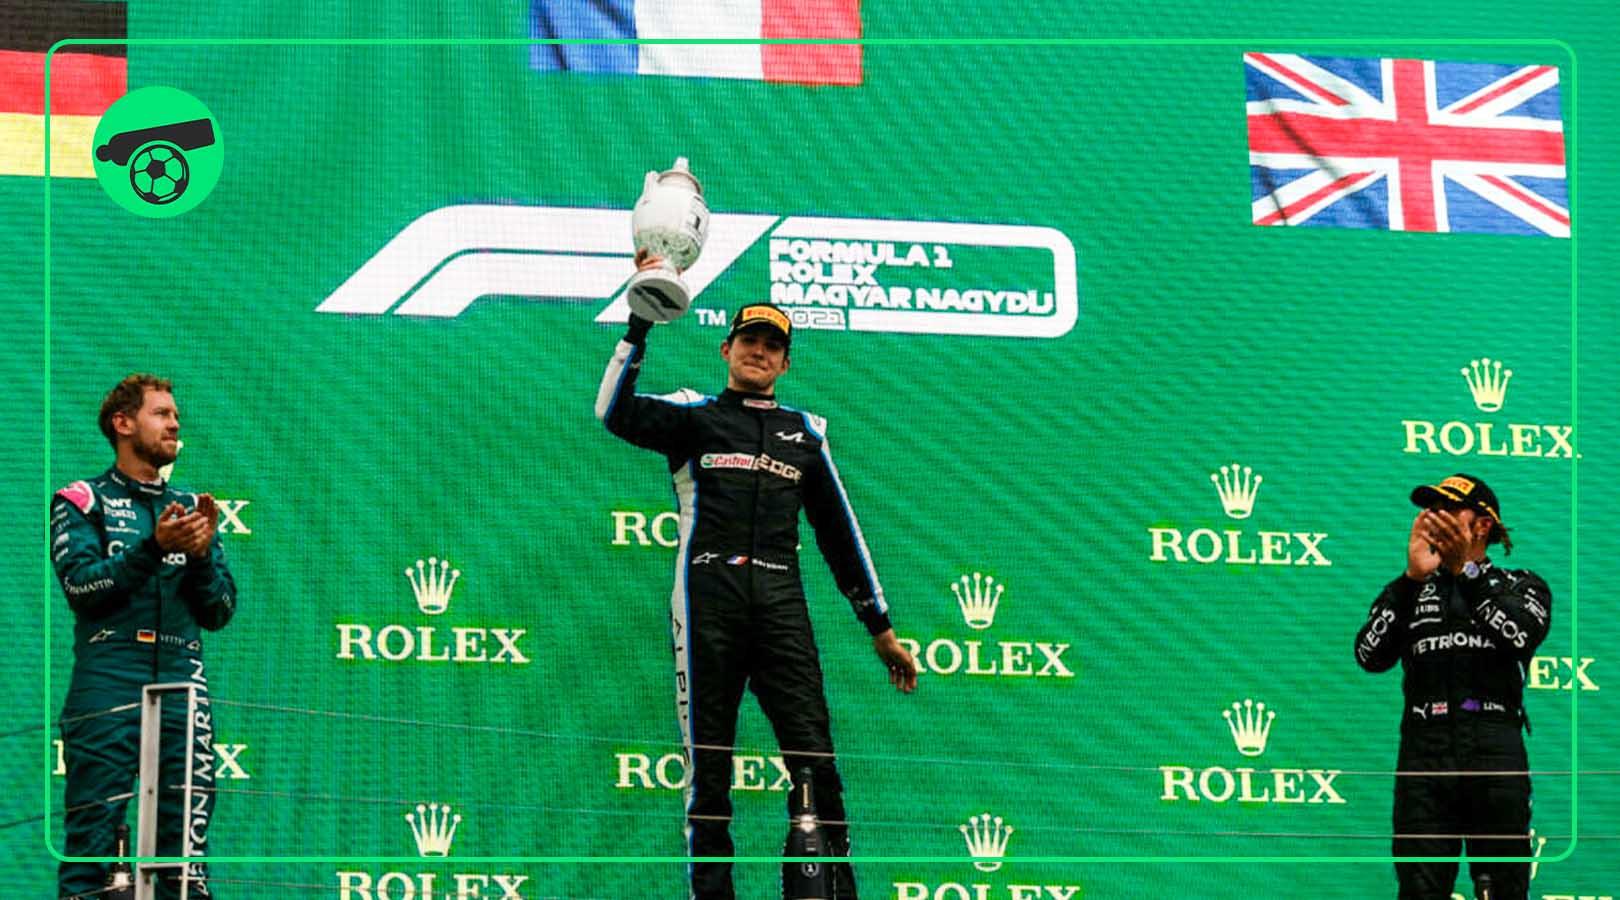 Alpine's Esteban Ocon win Hungary GP with Hamilton second